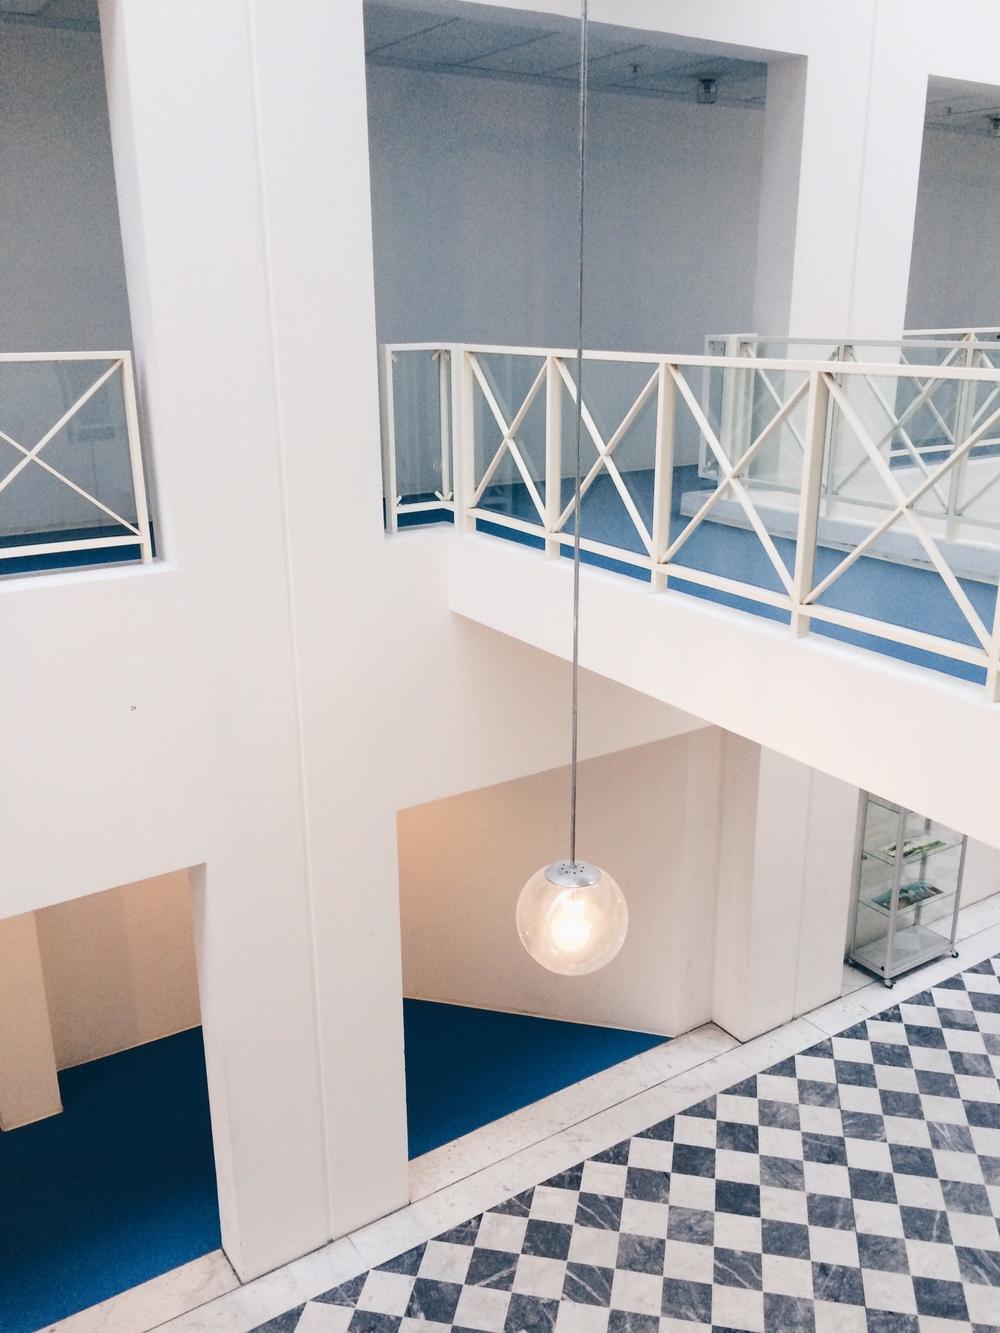 Dalgas Have, Copenhagen Business School / shellsten